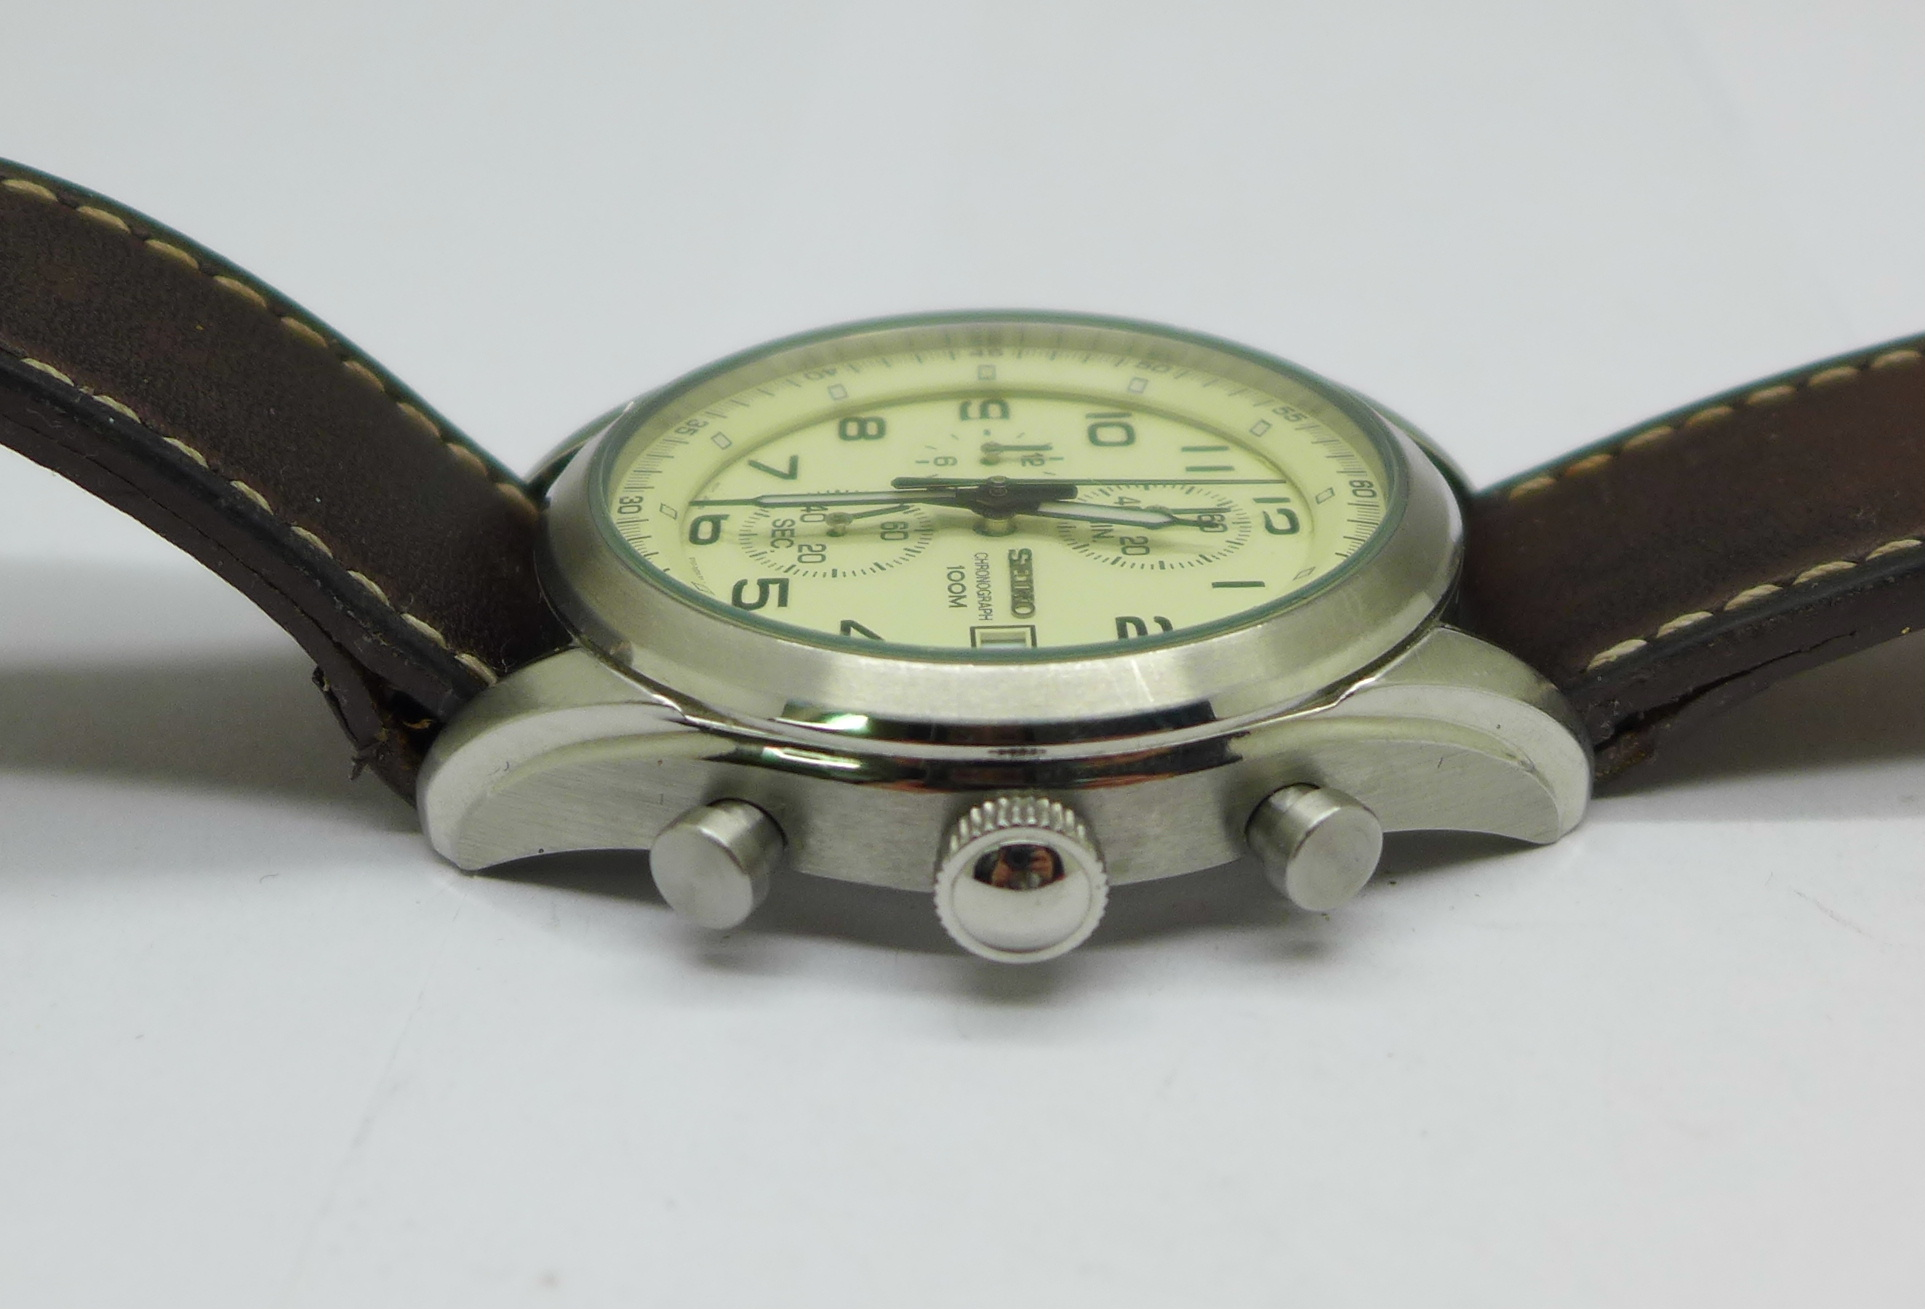 A Seiko chronograph wristwatch - Image 2 of 6